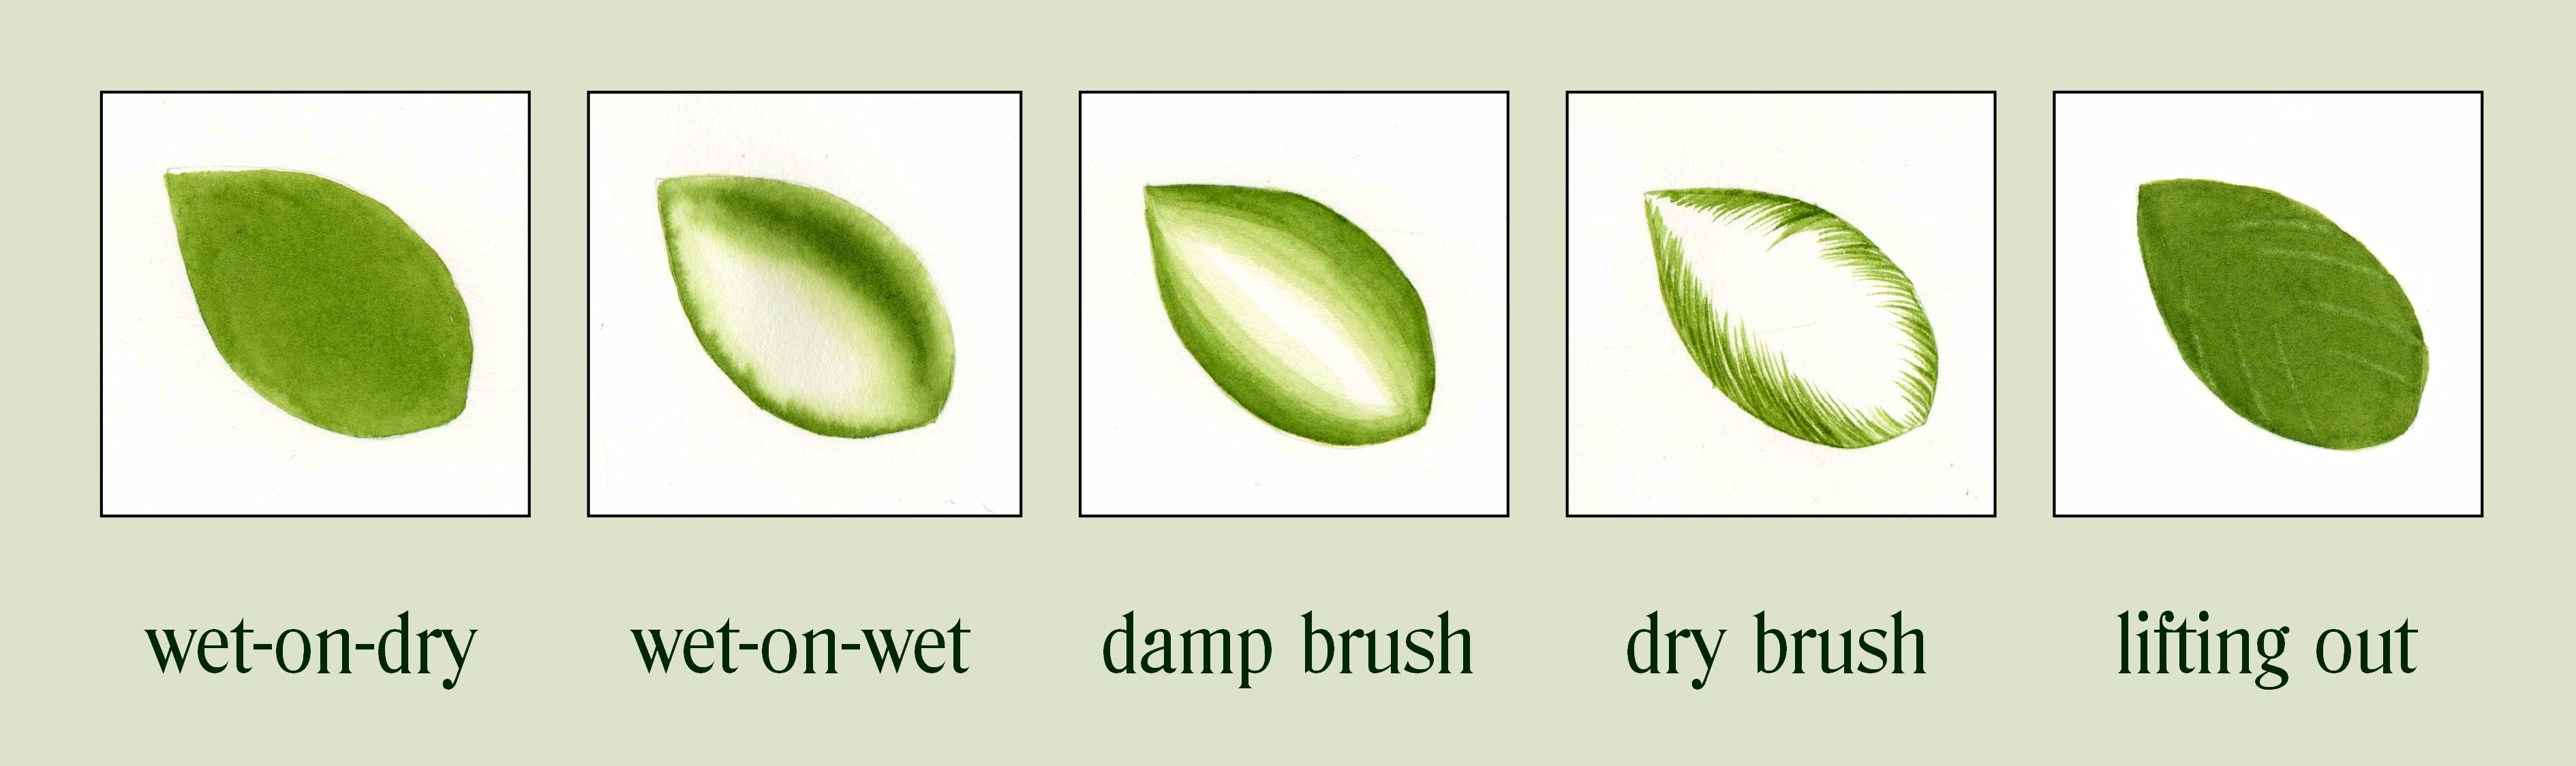 whole tutorial julia trickey botanical art tutorials